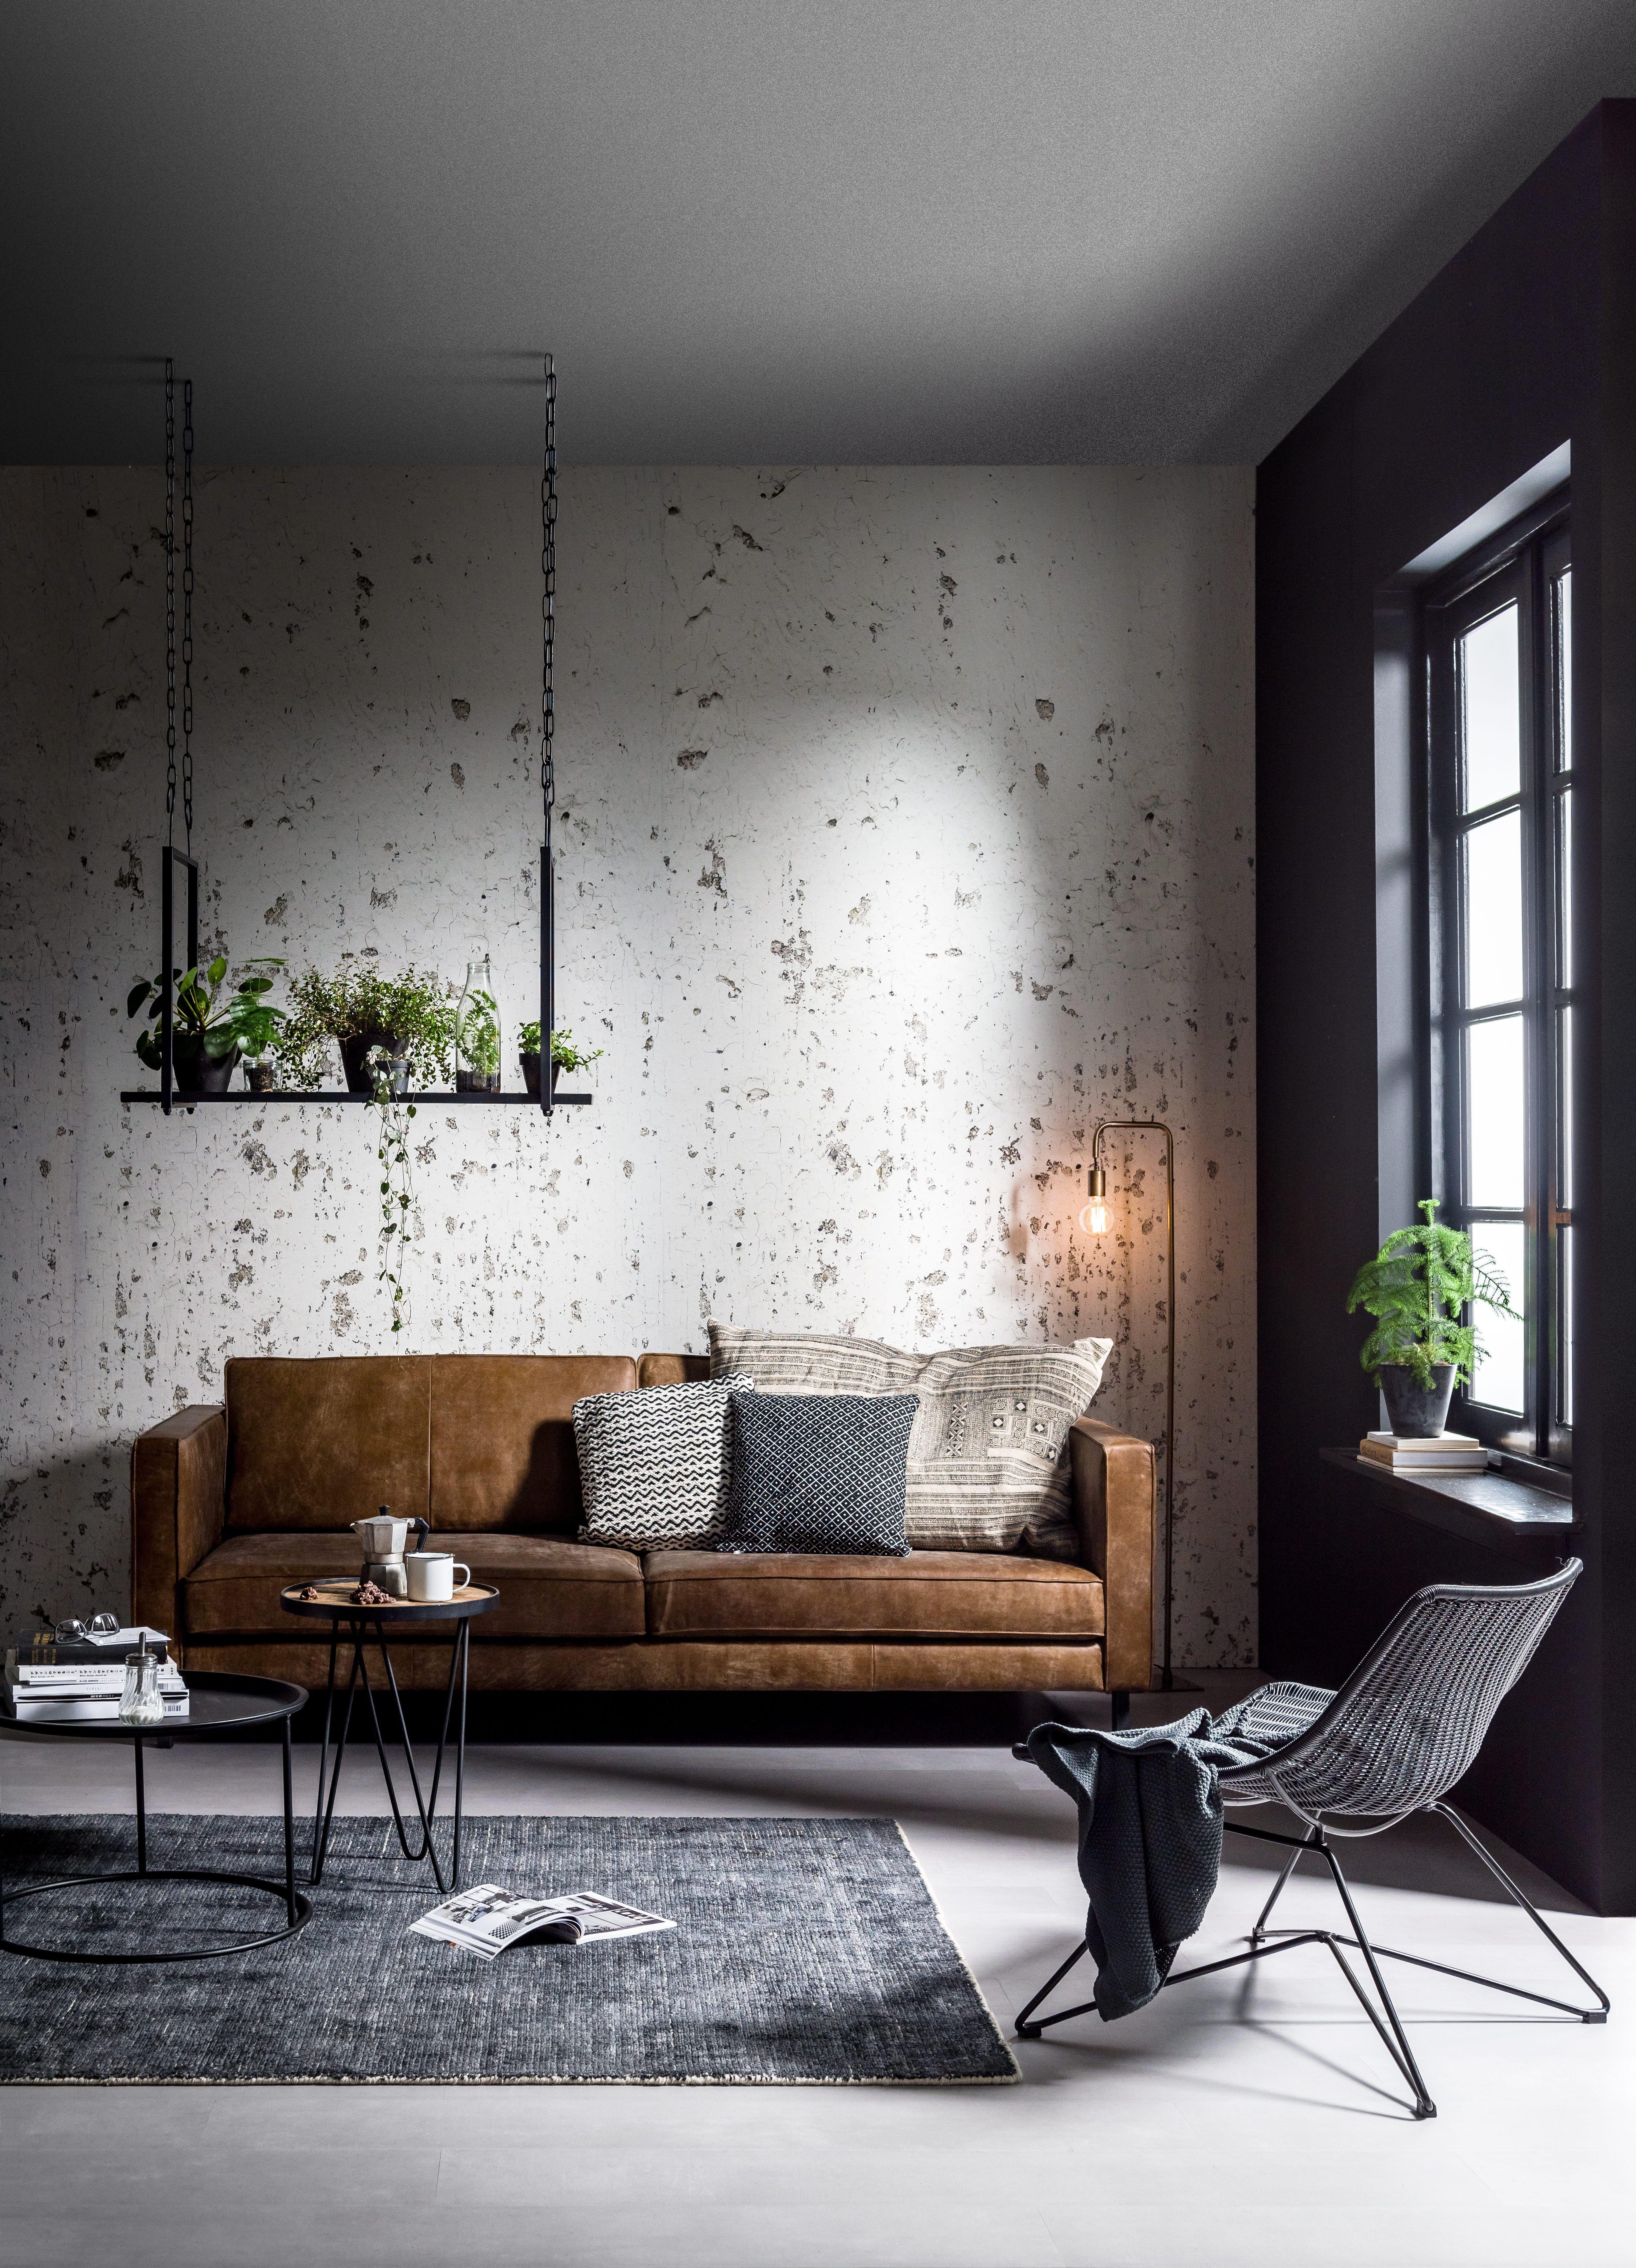 Industrial Contemporary Living Room Creëer Je Eigen Basic Industrial Interieur Met Ons Nieuwe